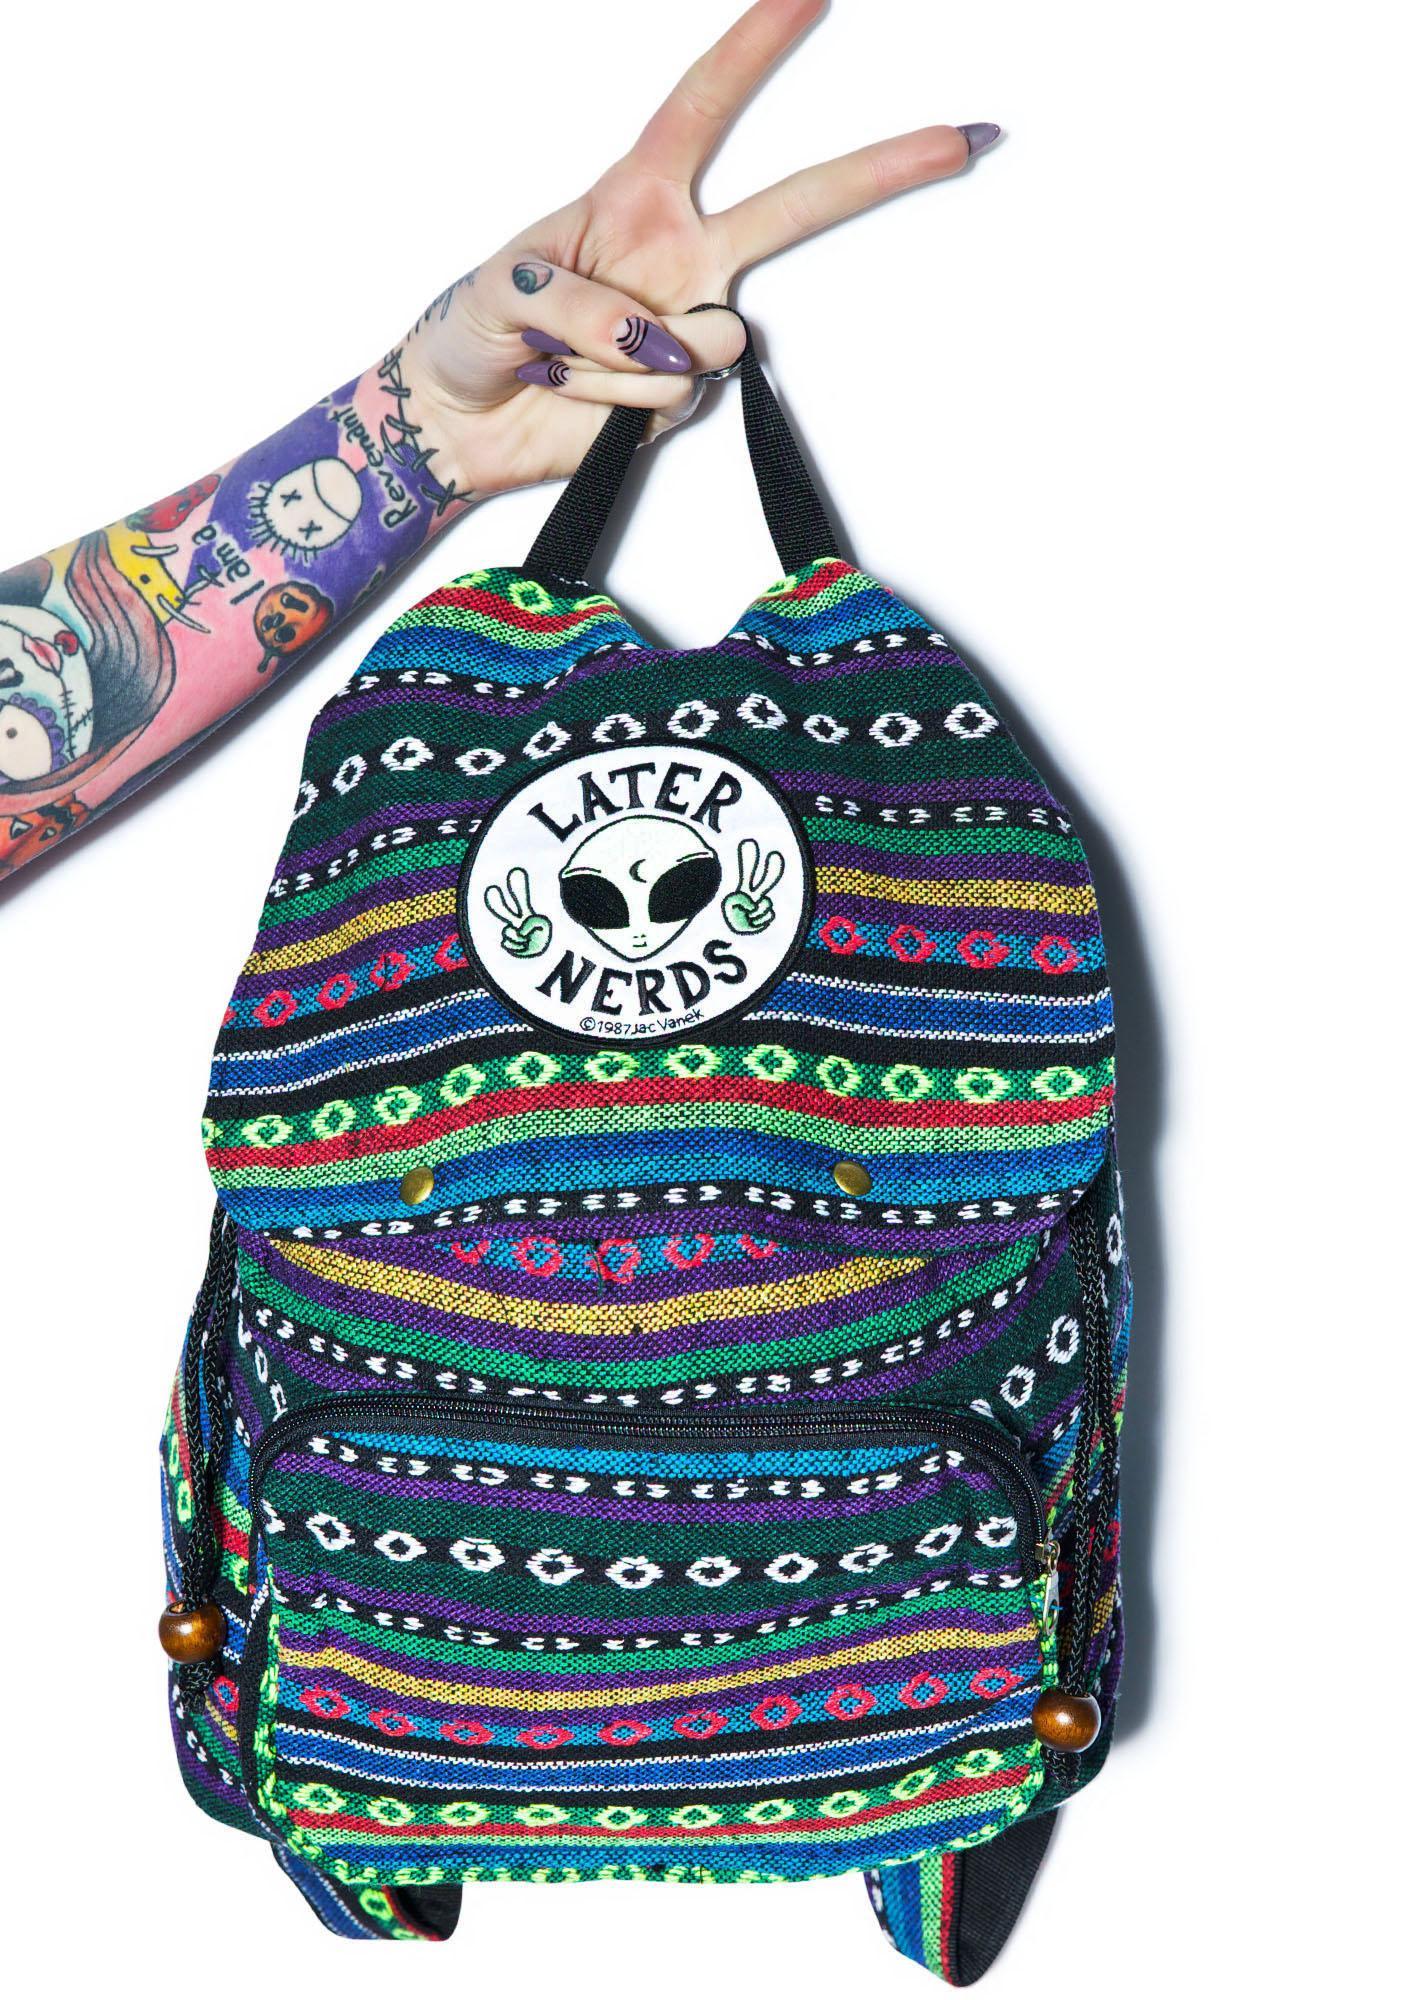 Jac Vanek Later Nerds Backpack